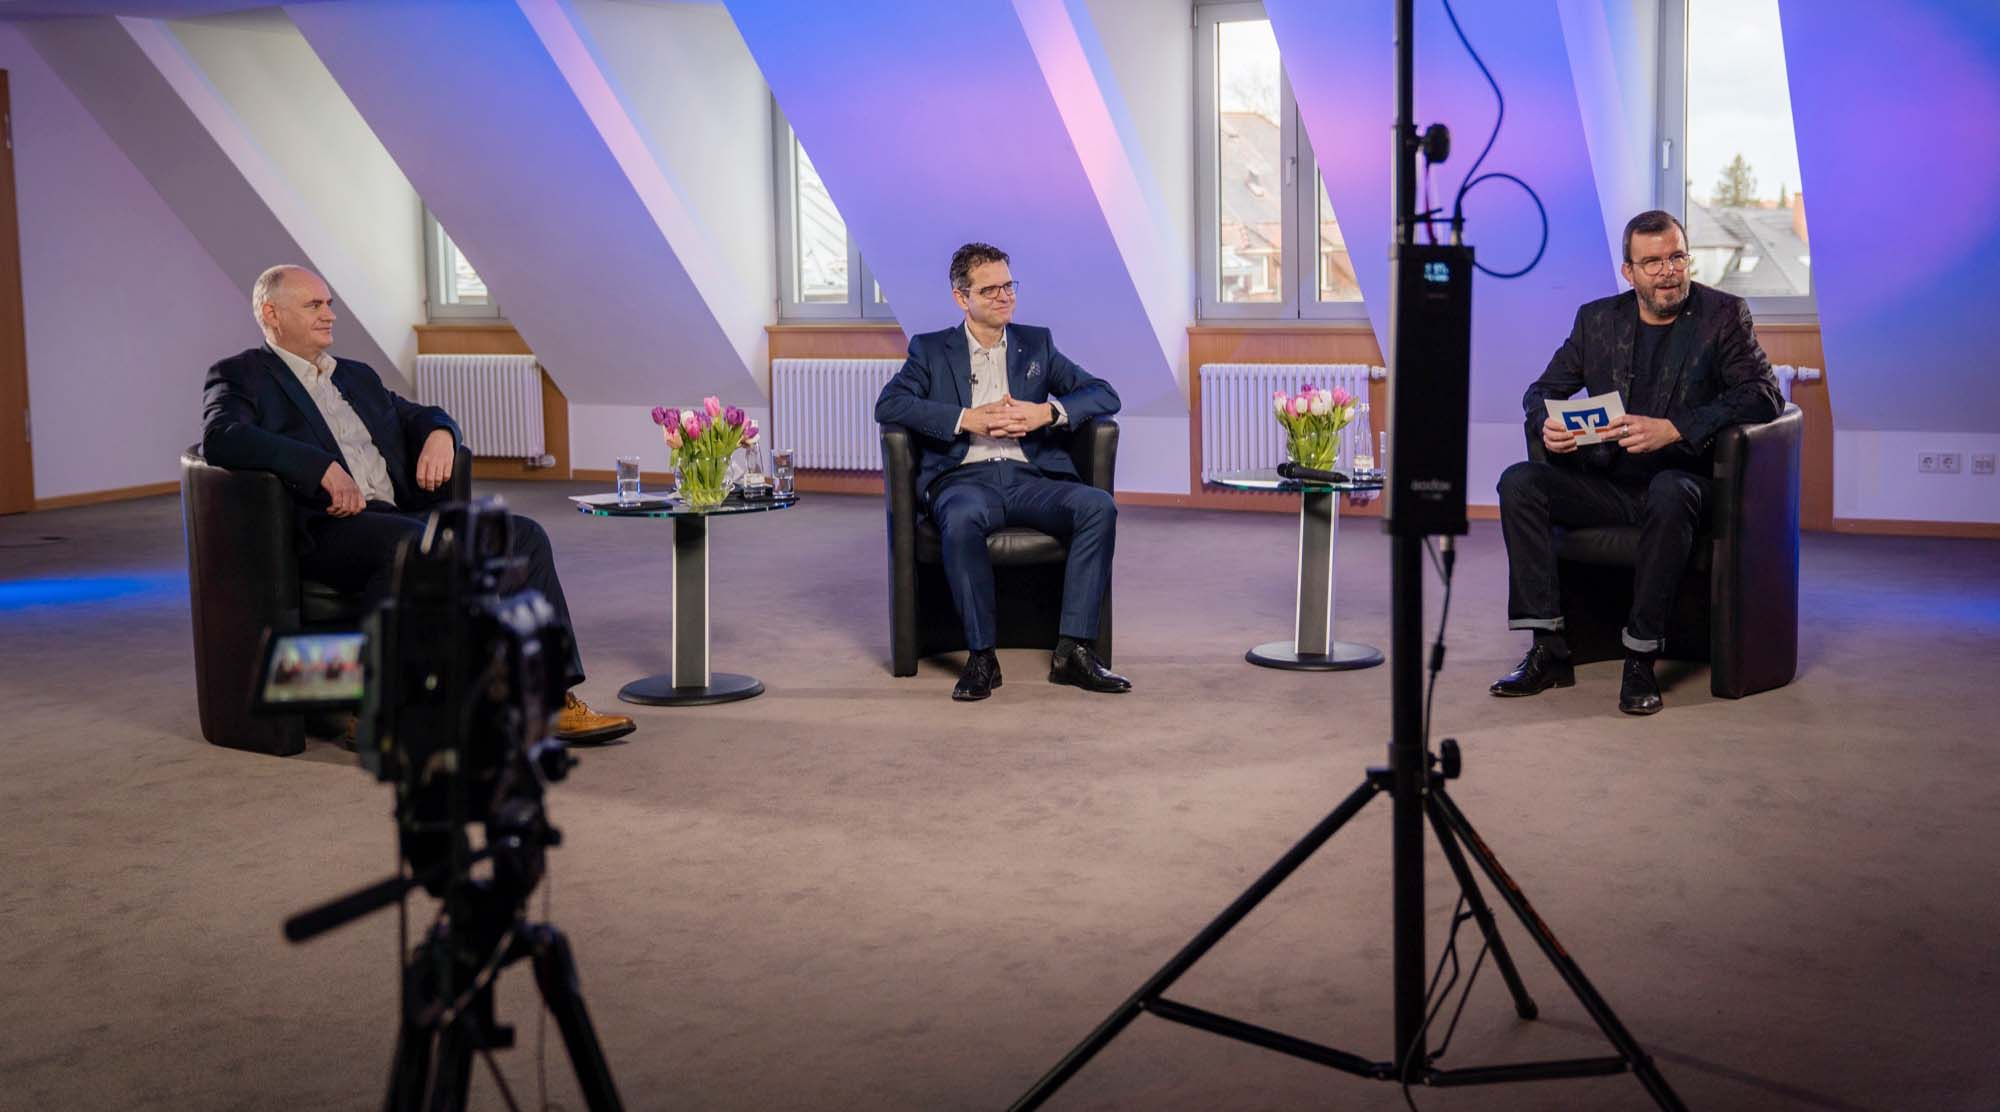 2021-2-5-LR-Volksbank- Bilanzpressekonferenz A7109141